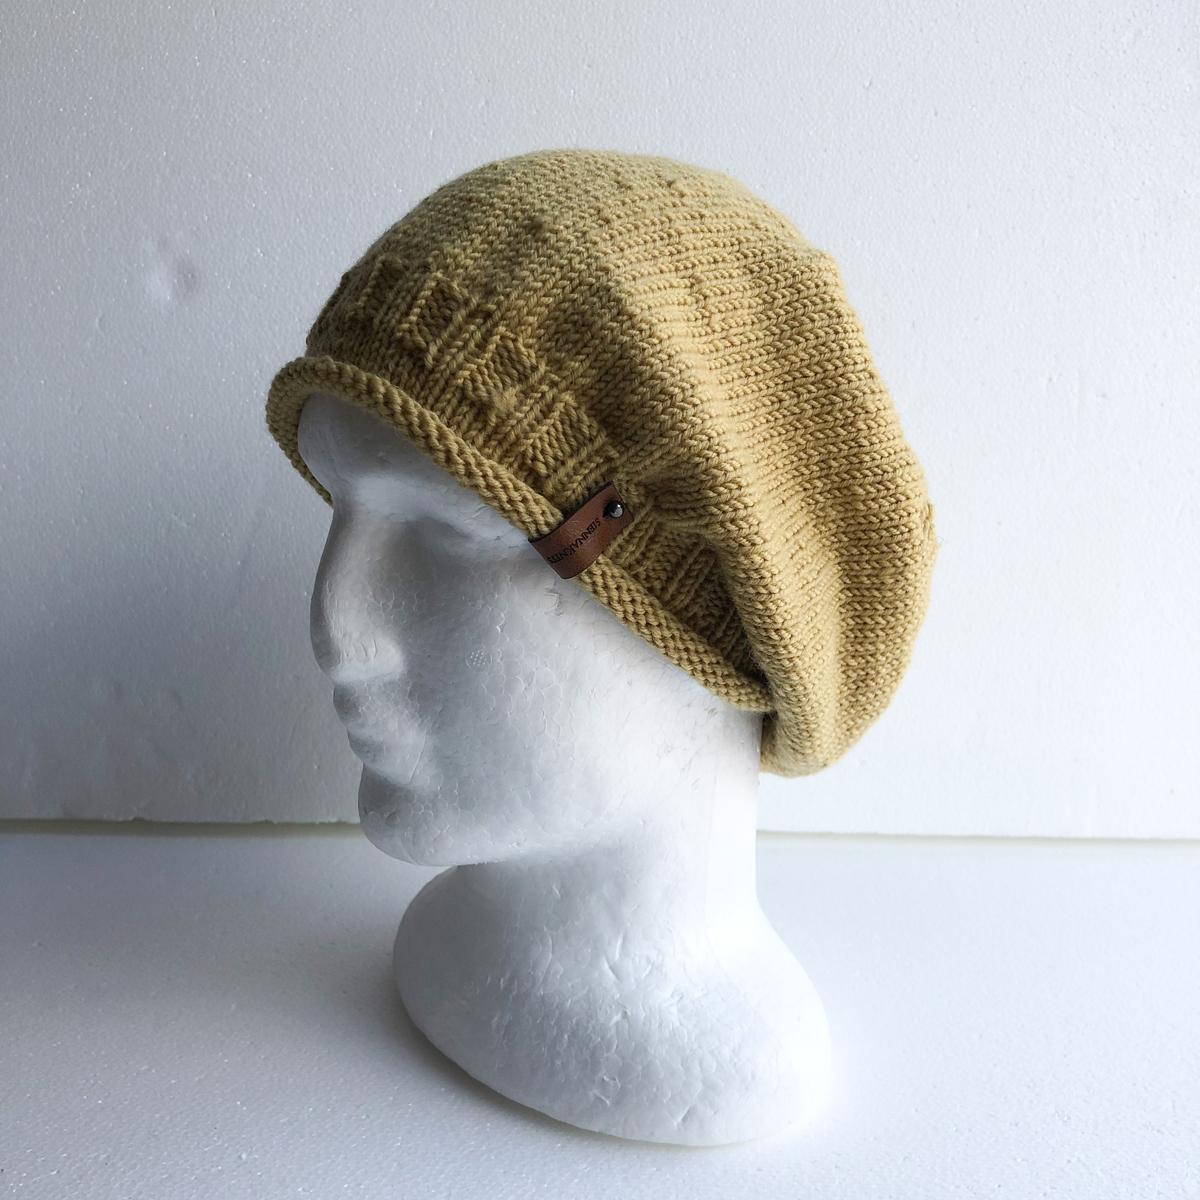 100% Wool Mustard Knit Women Slouchy Beanie With Roll Up Brim By SiennaKnits